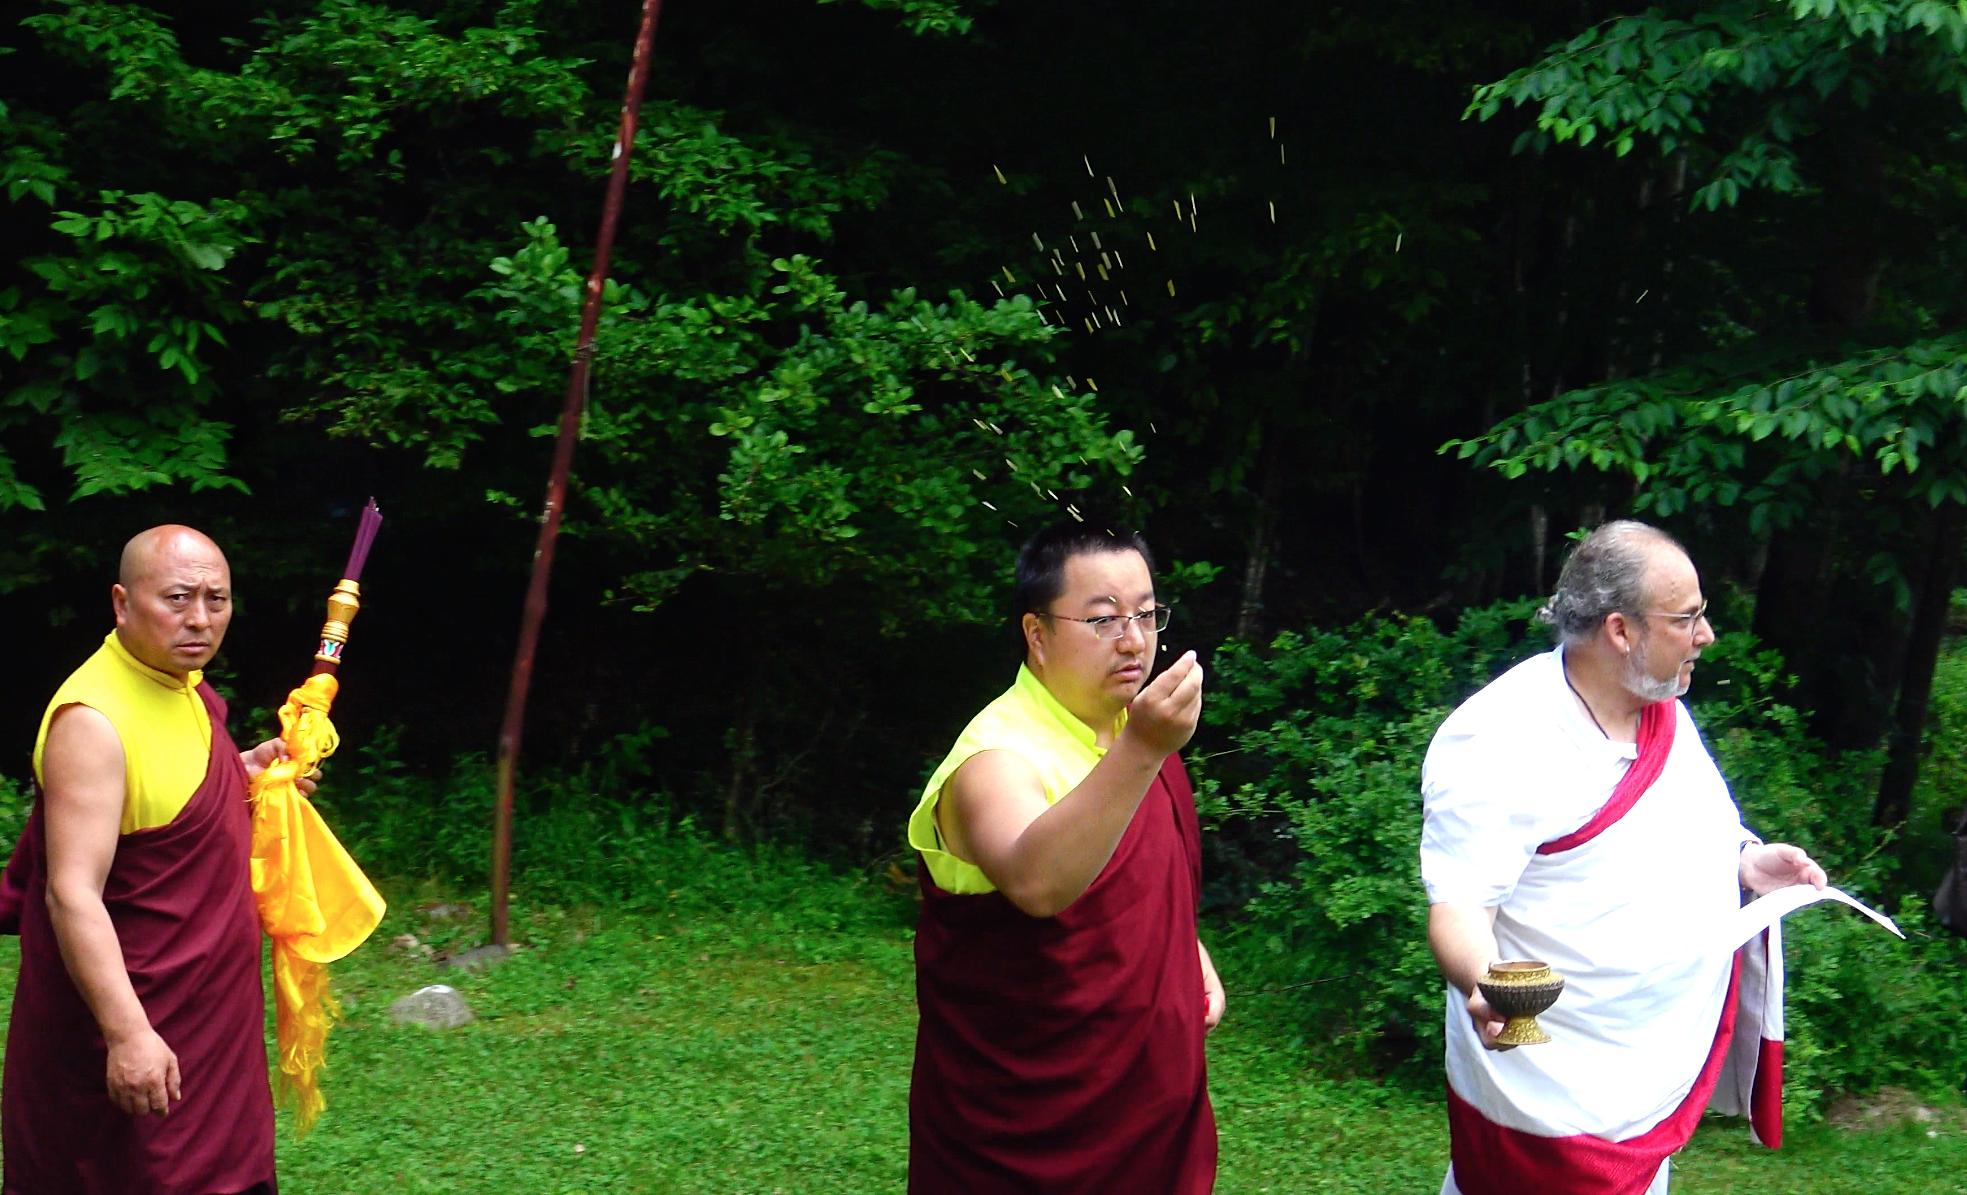 Circumambulating and blessing the stupa